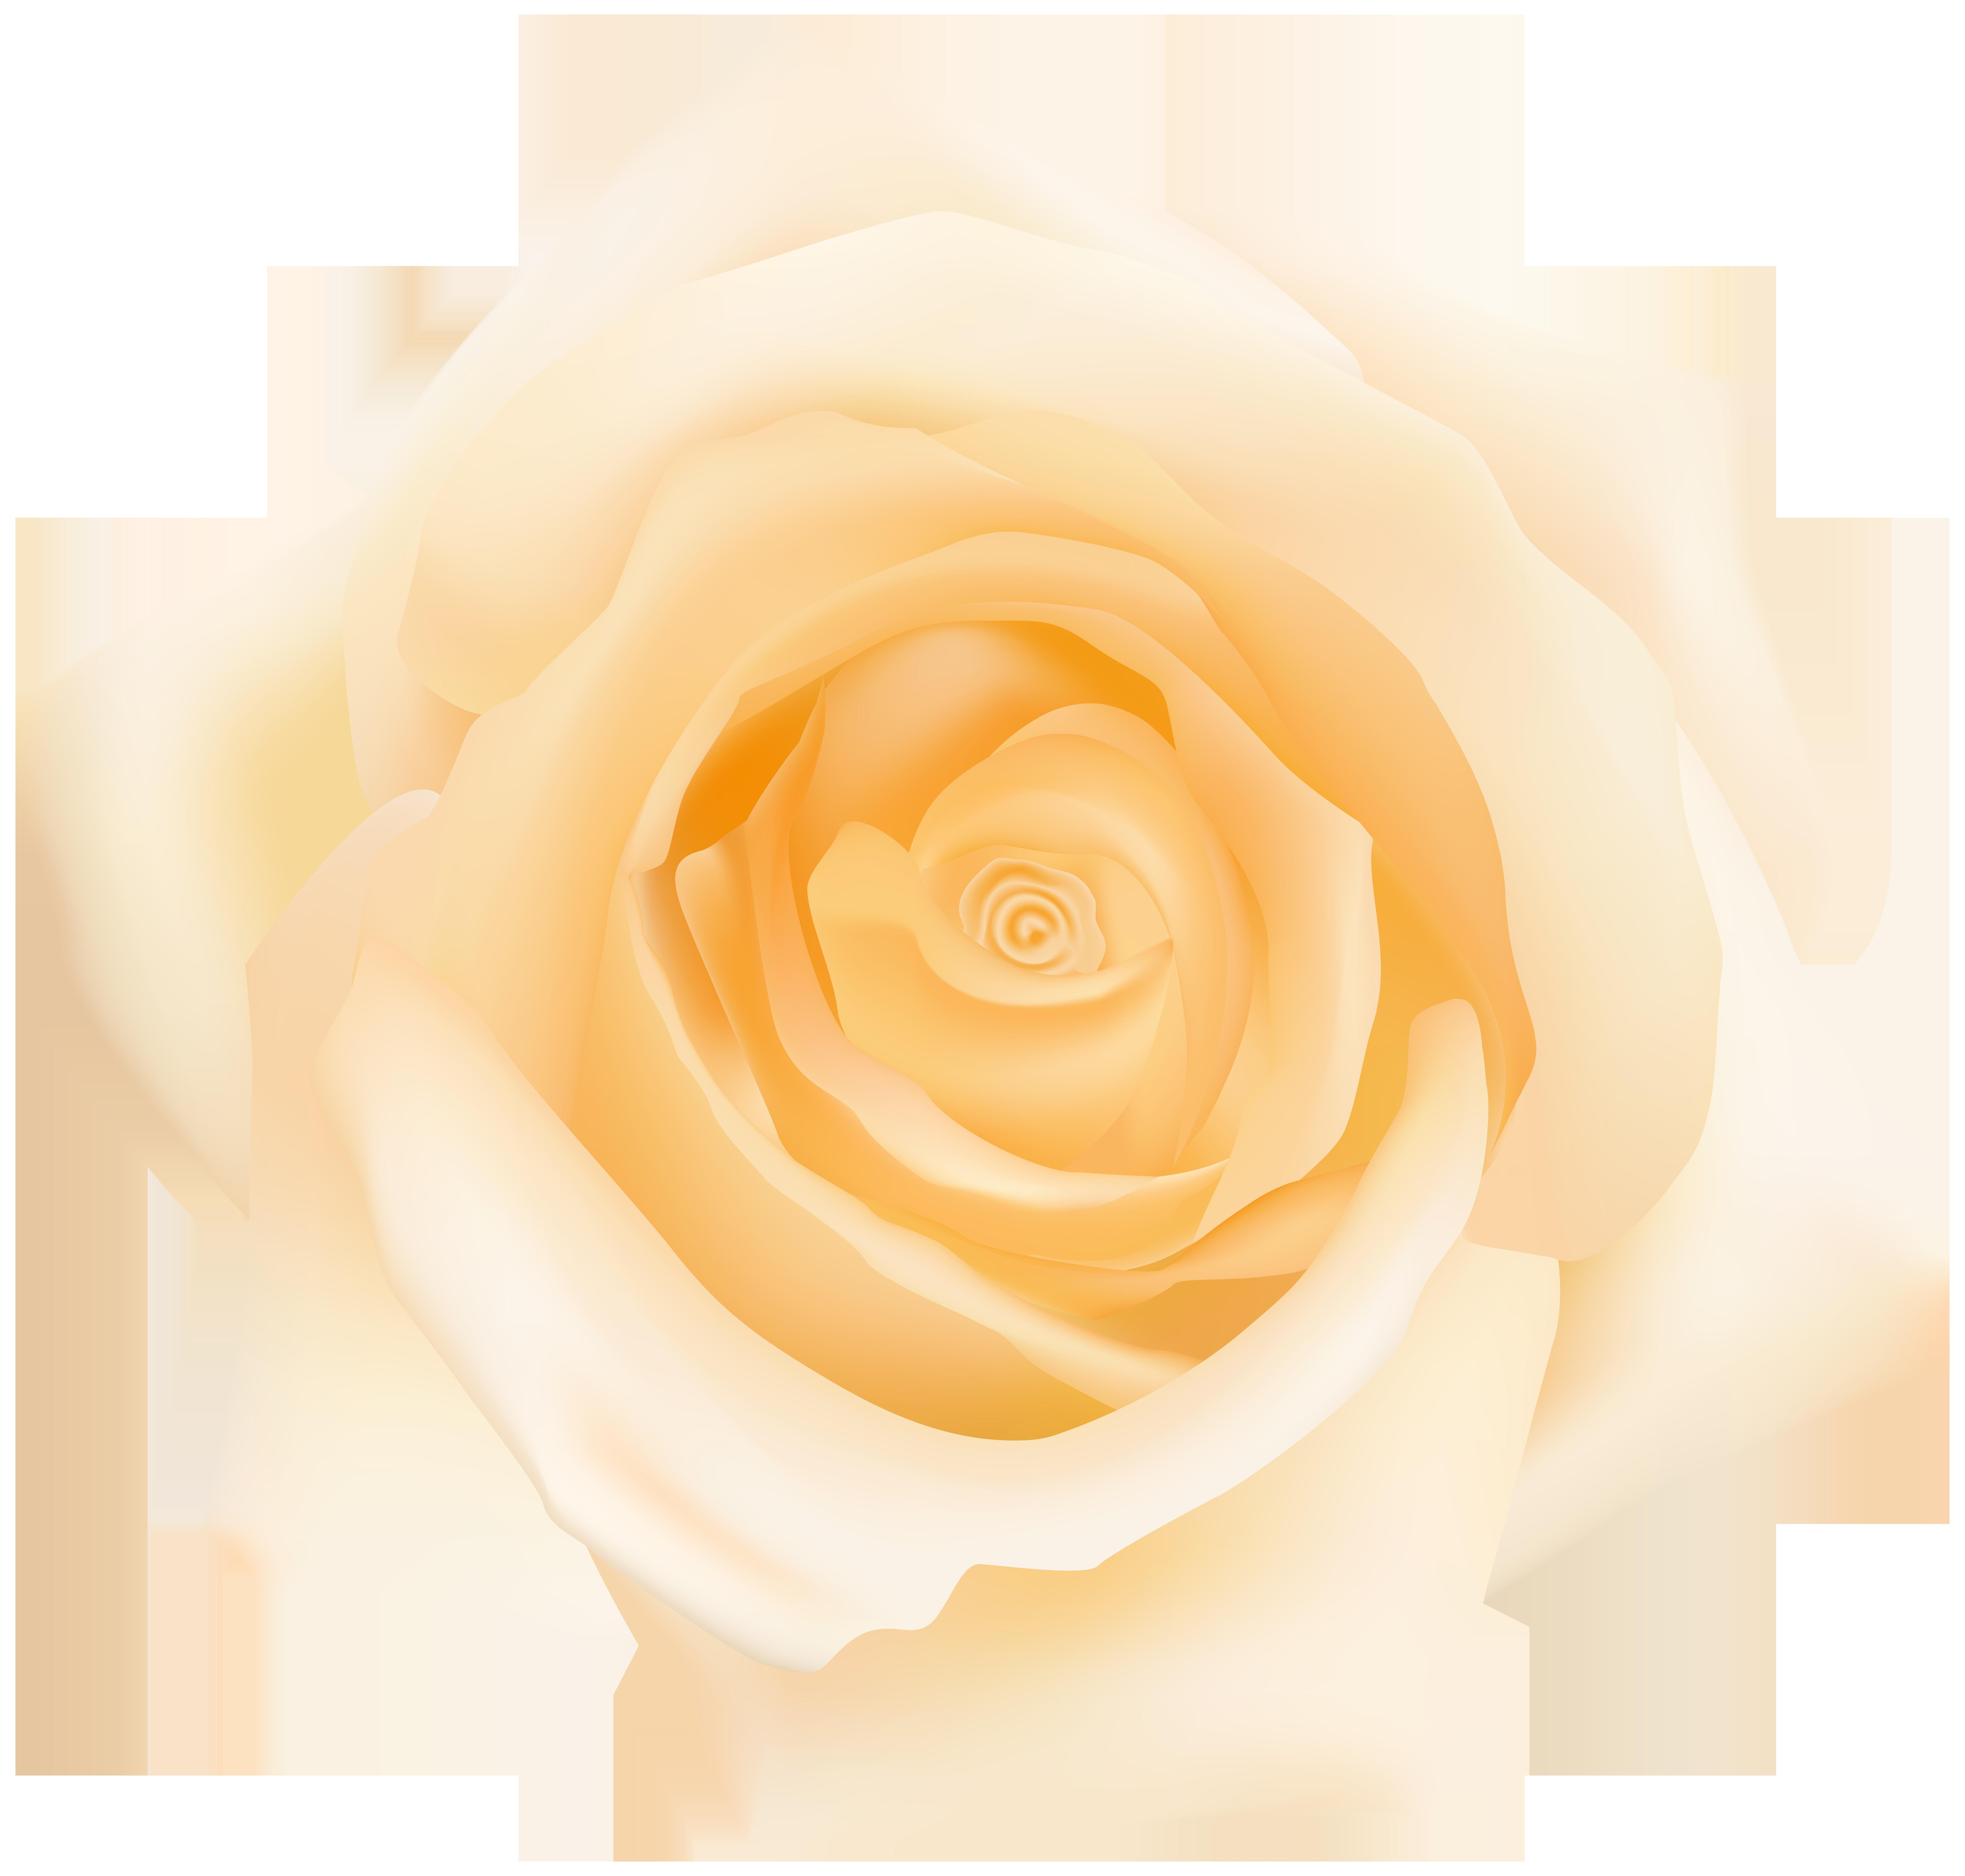 Garden cut flowers petal. Clipart roses yellow rose